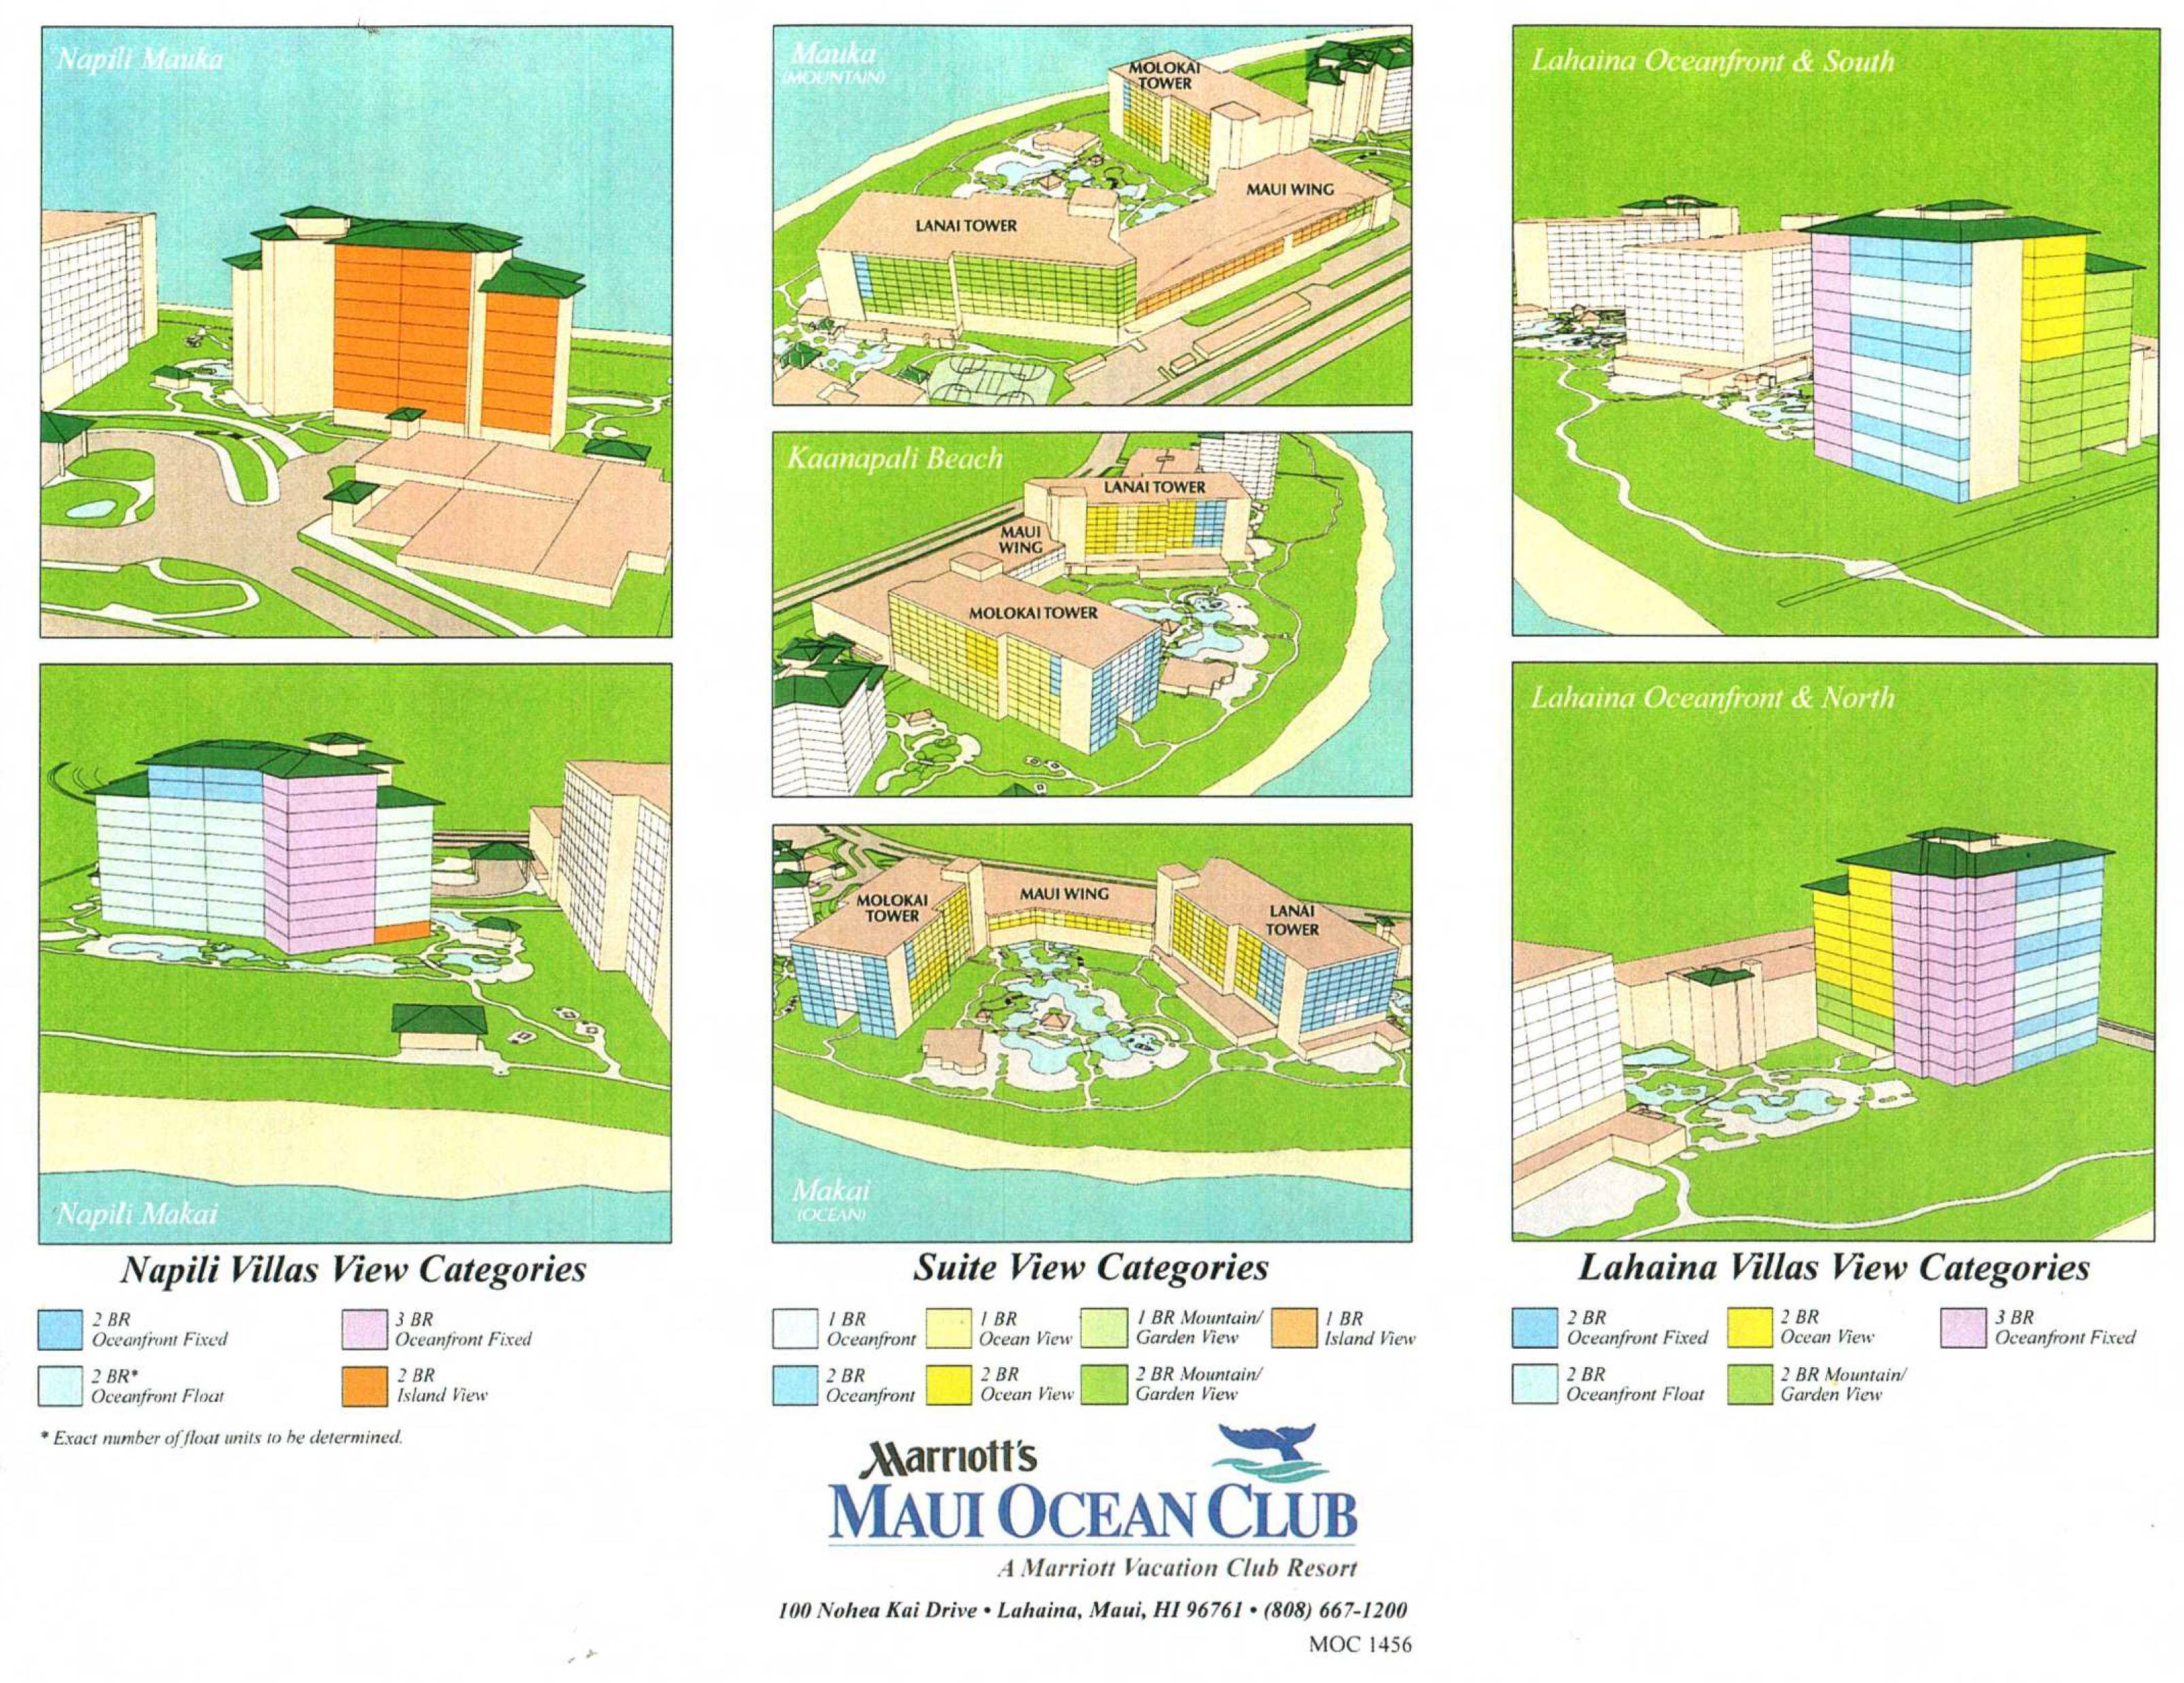 map marriott maui ocean club view categories. marriott  advantage vacation timeshare resales